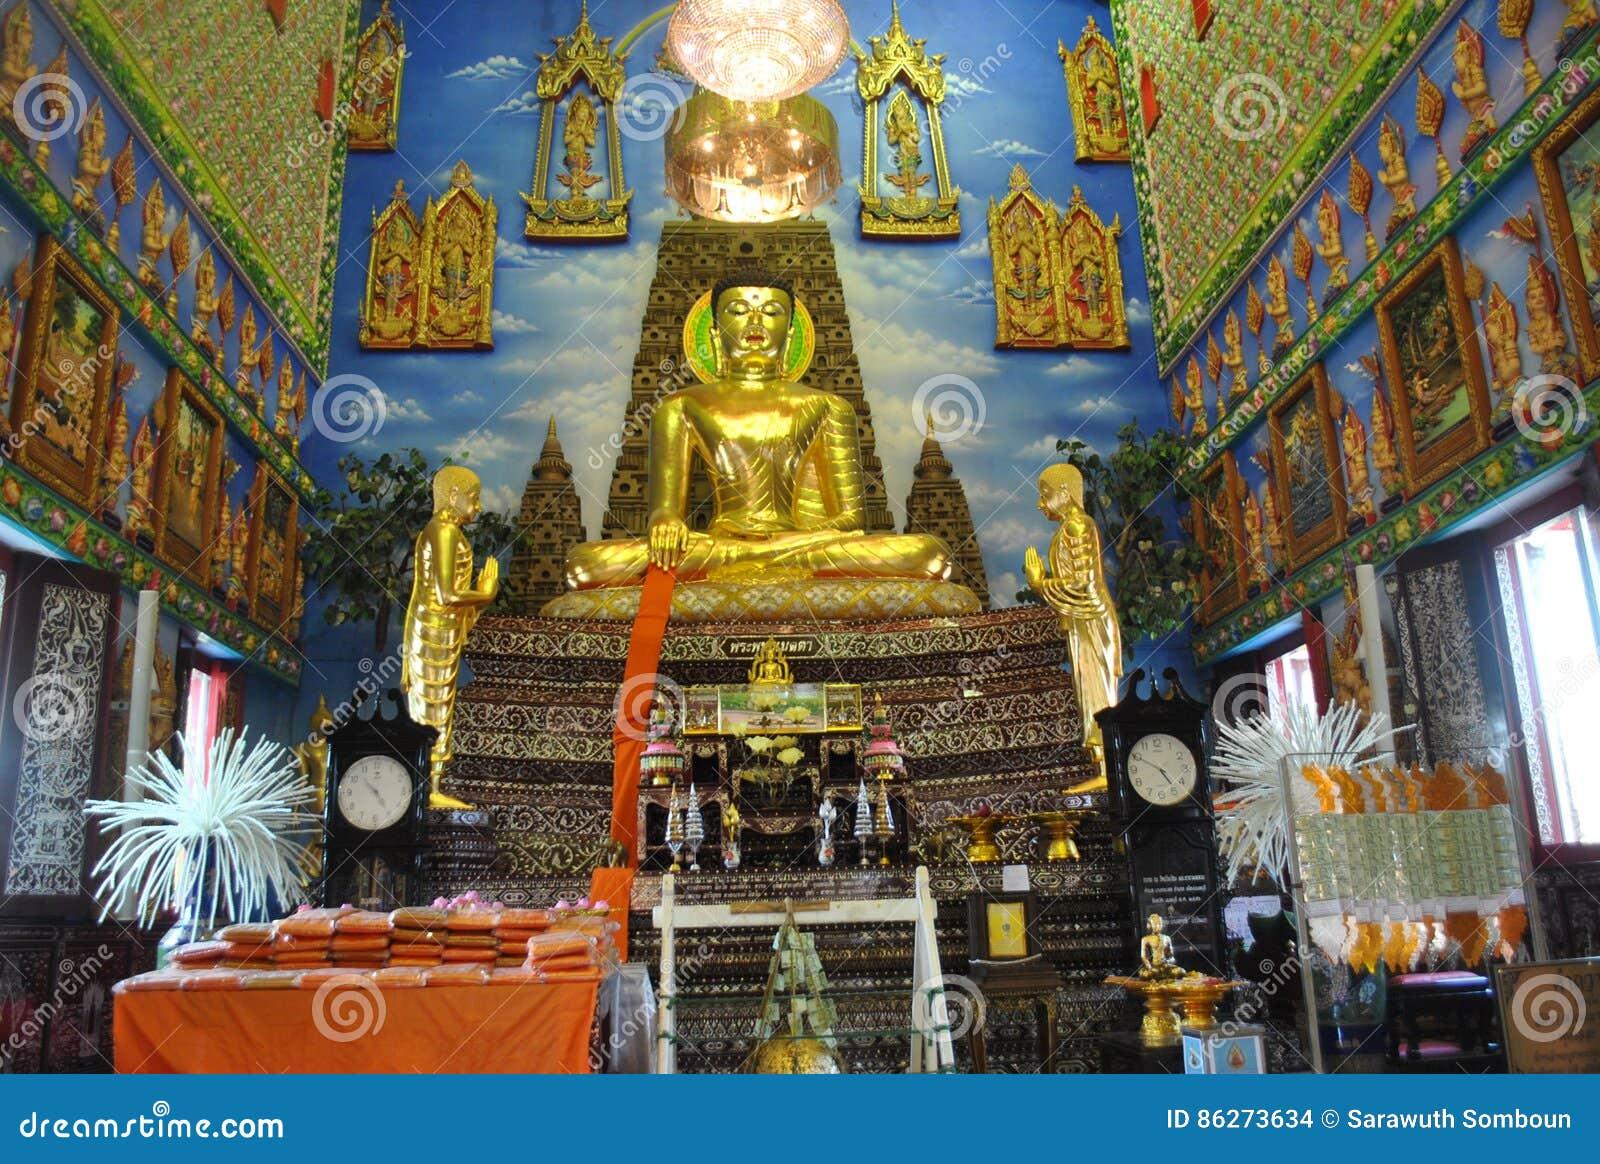 Gold buddha statue Architectur Insight buddhist building wat buakwan nonthaburi thailand